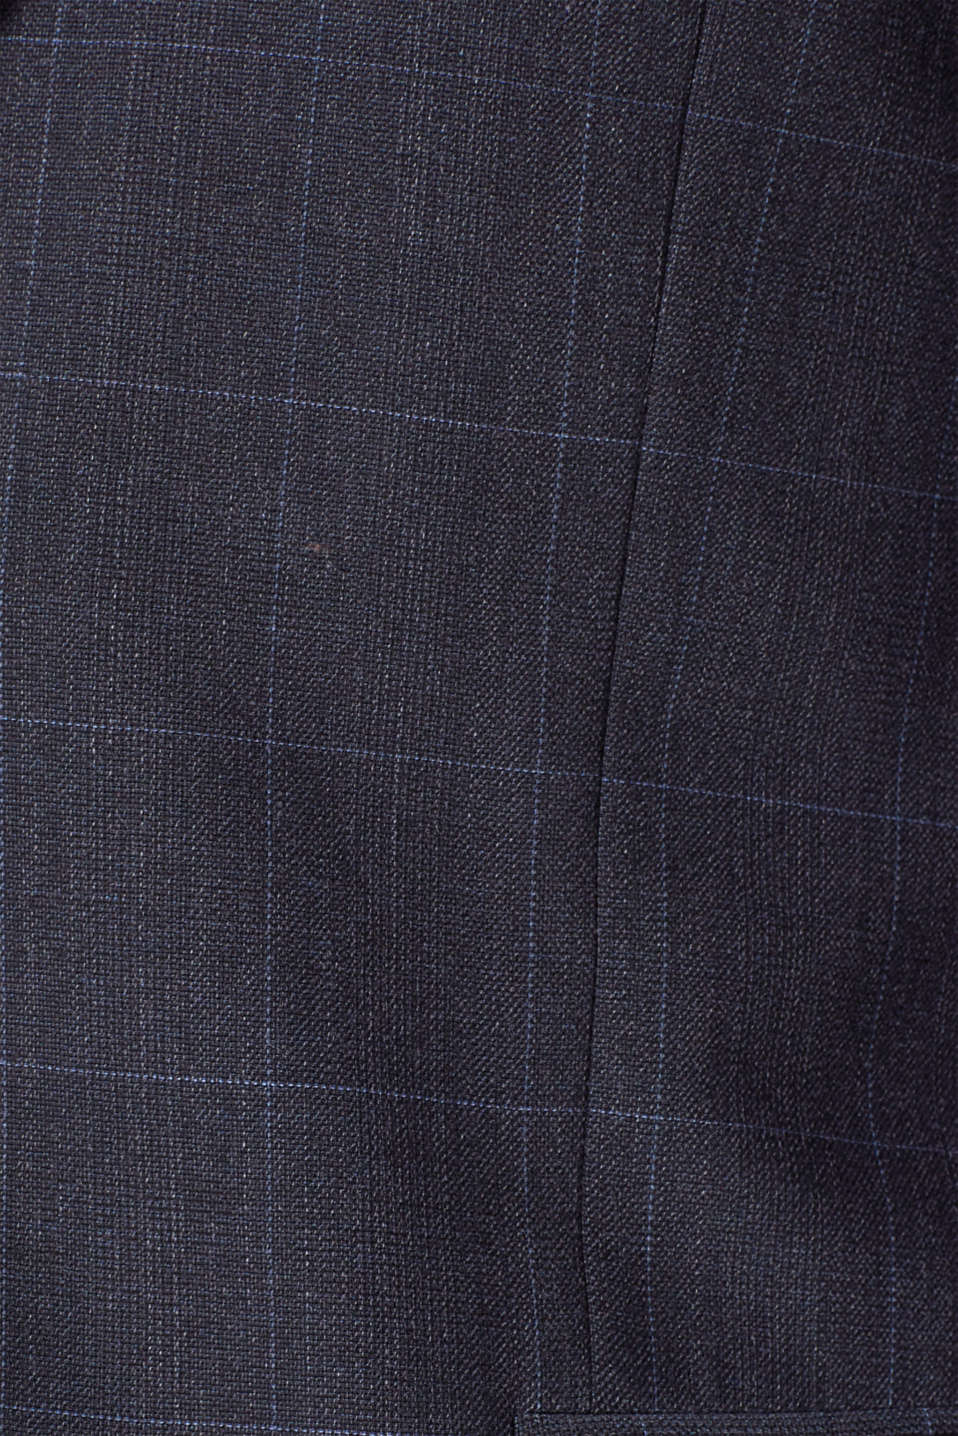 Blazers suit, DARK BLUE, detail image number 4